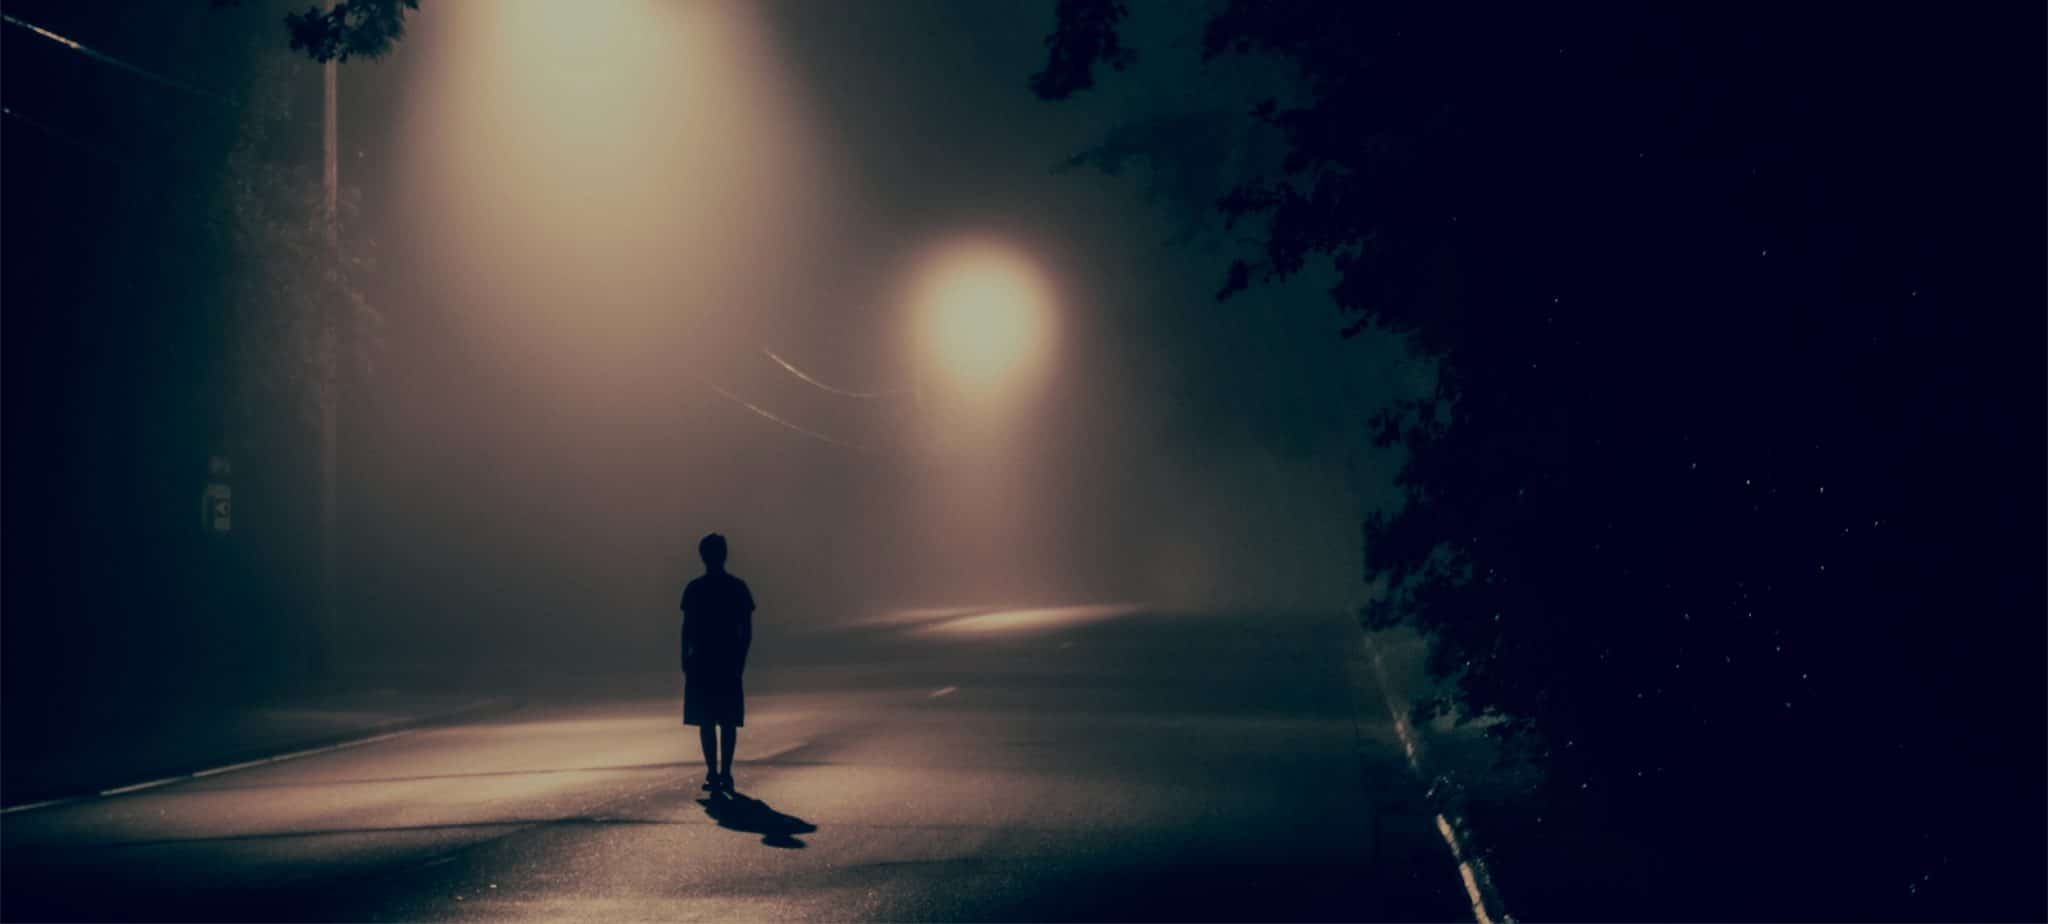 Man walking down lonely street